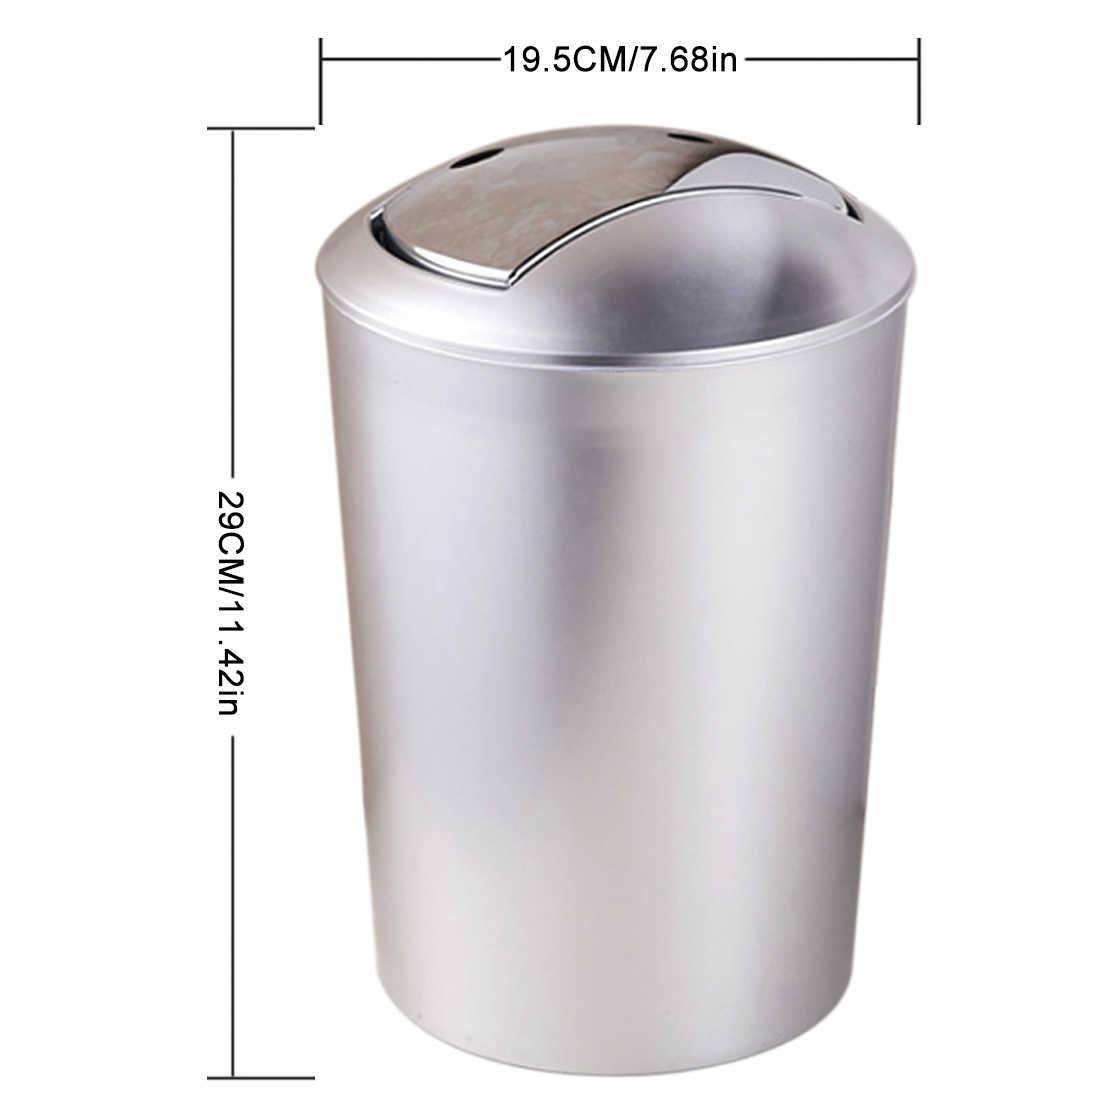 Waste Bins Solid Wood Wastebasket Or Recycling Bin Swing Lid Trash Can Kitchen Waste Bin Decorative Garbage Can For Office Bathroom Bedroom Wastebasket Home Storage Organization